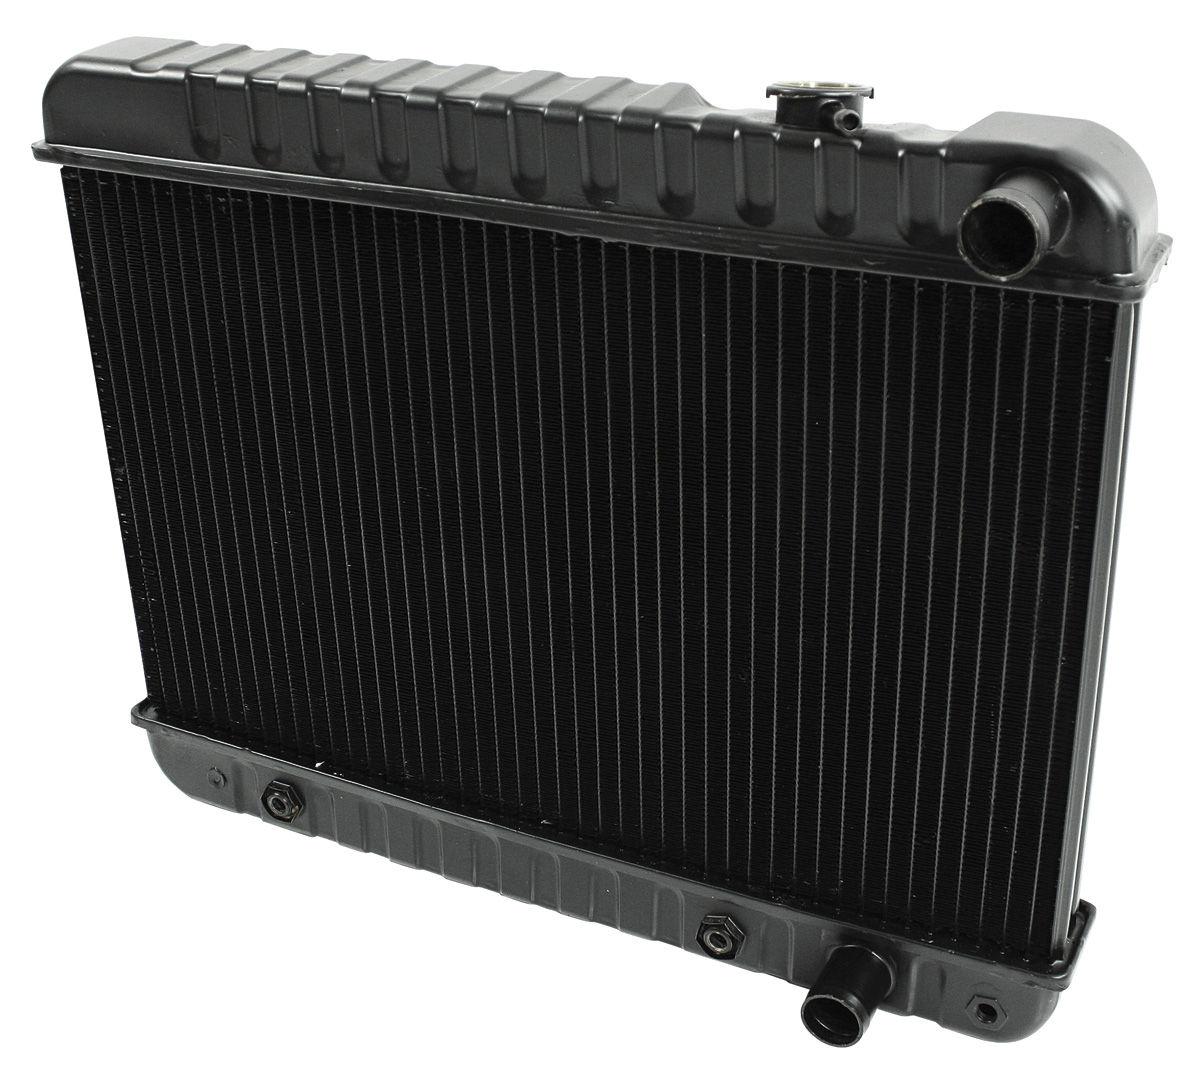 "Radiator, 1961-63 Skylark, 6-Cyl., Manual, 2-Row, 12-3/8"" X 25-1/4"" X 1-1/4"""